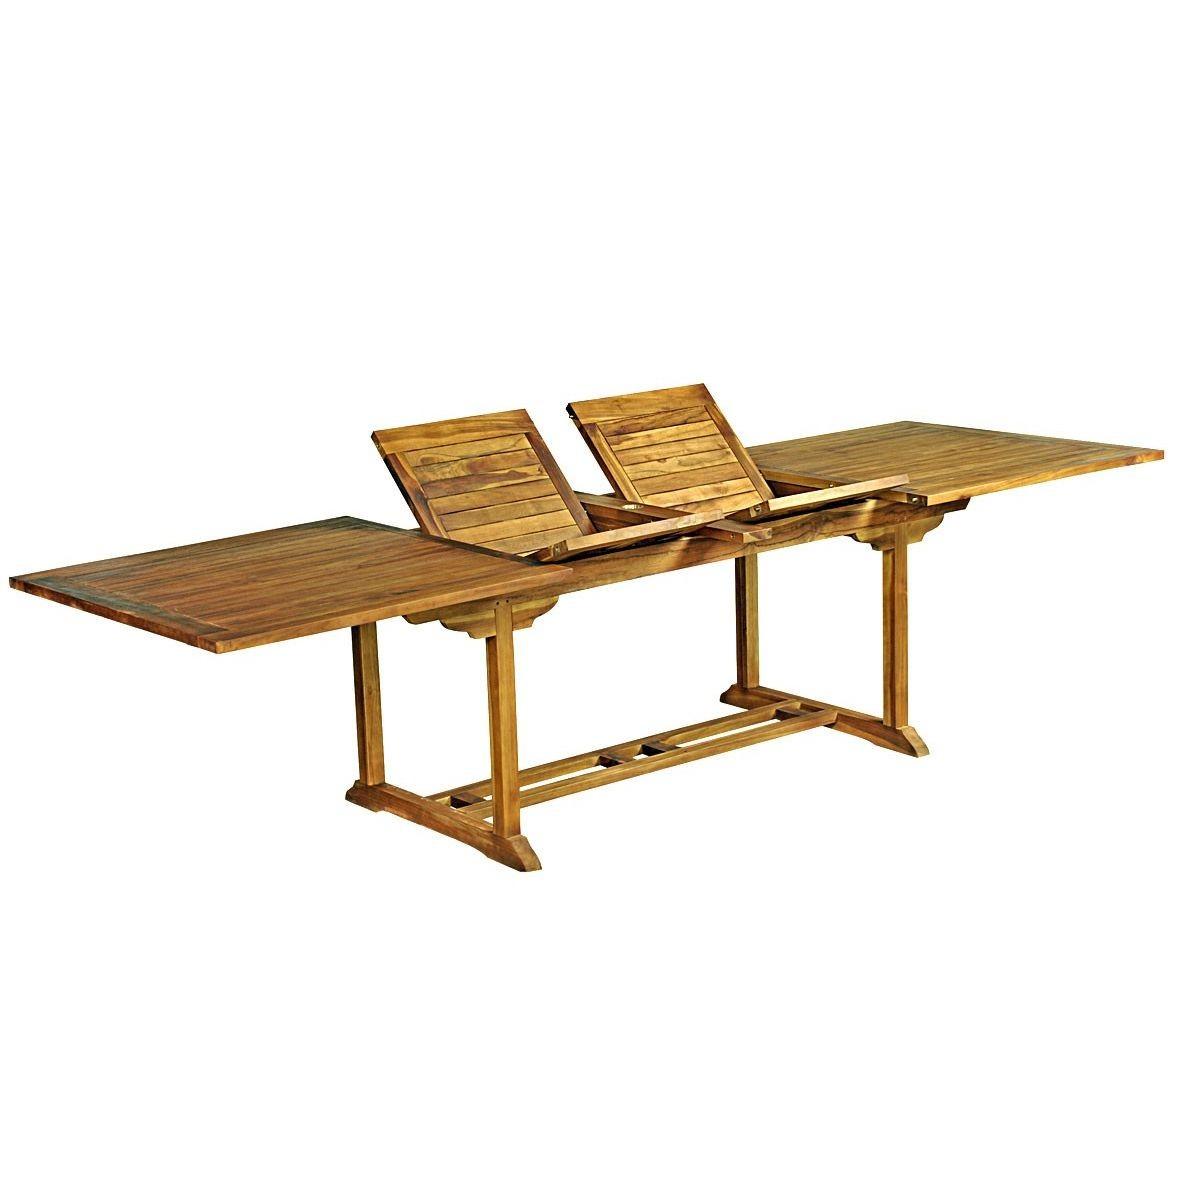 Table De Jardin Xxl En Teck Huilé - Double Rallonge Papillon ... à Table De Jardin Xxl